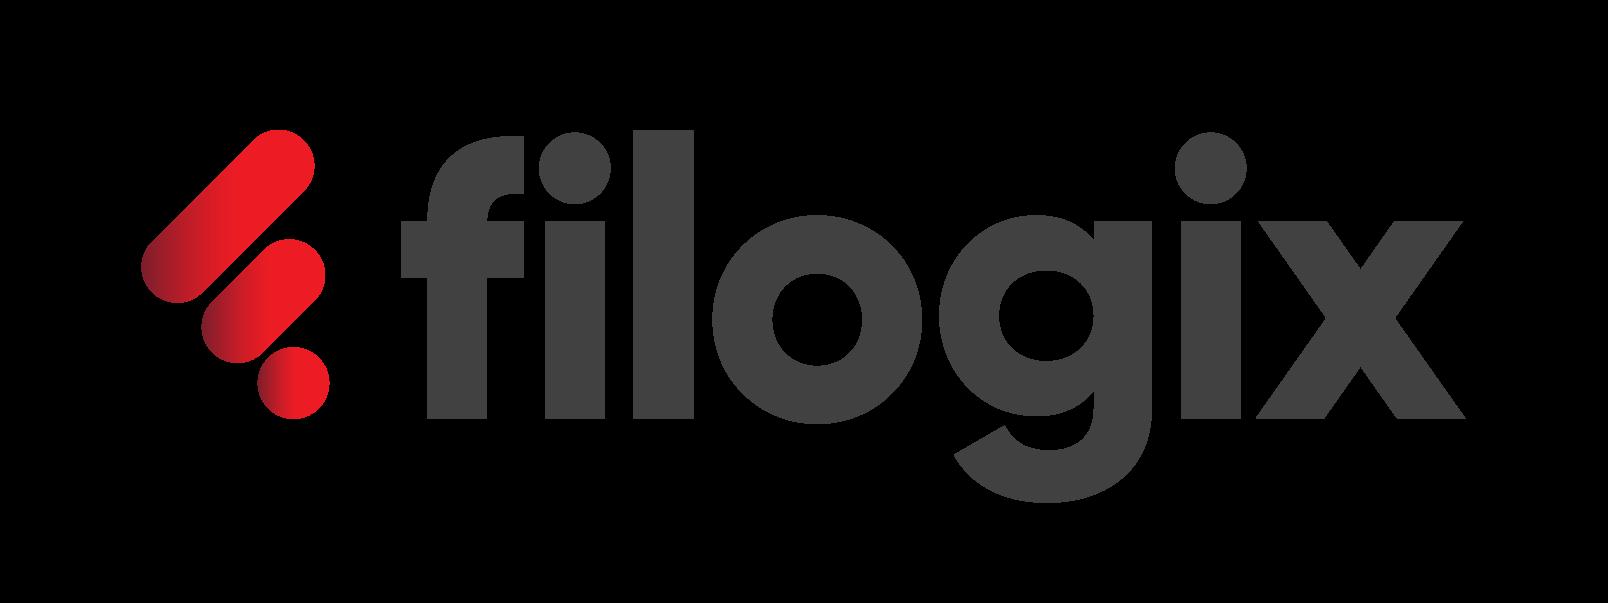 Broker One to Provide Digital Mortgage Capabilities Through Filogix Expert Pro